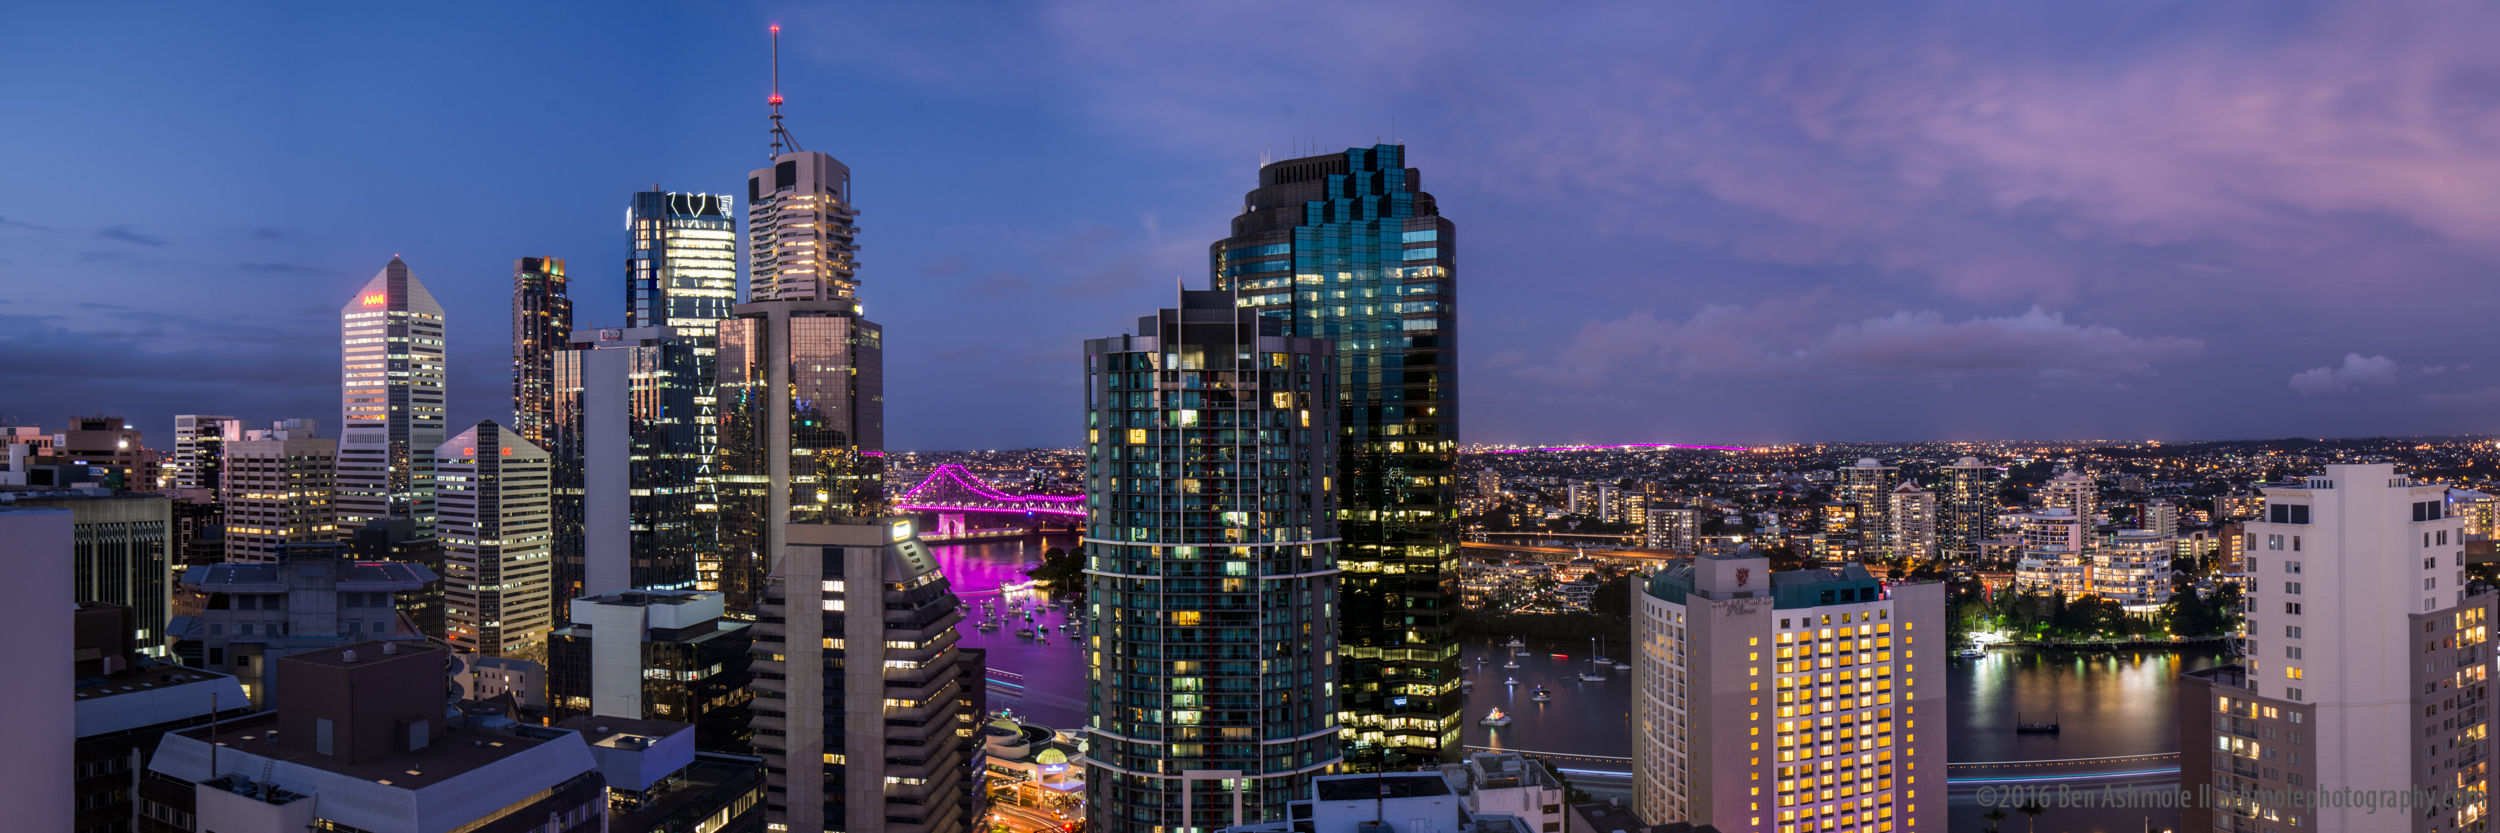 Brisbane City Blue Hour Panorama, Queensland, Australia